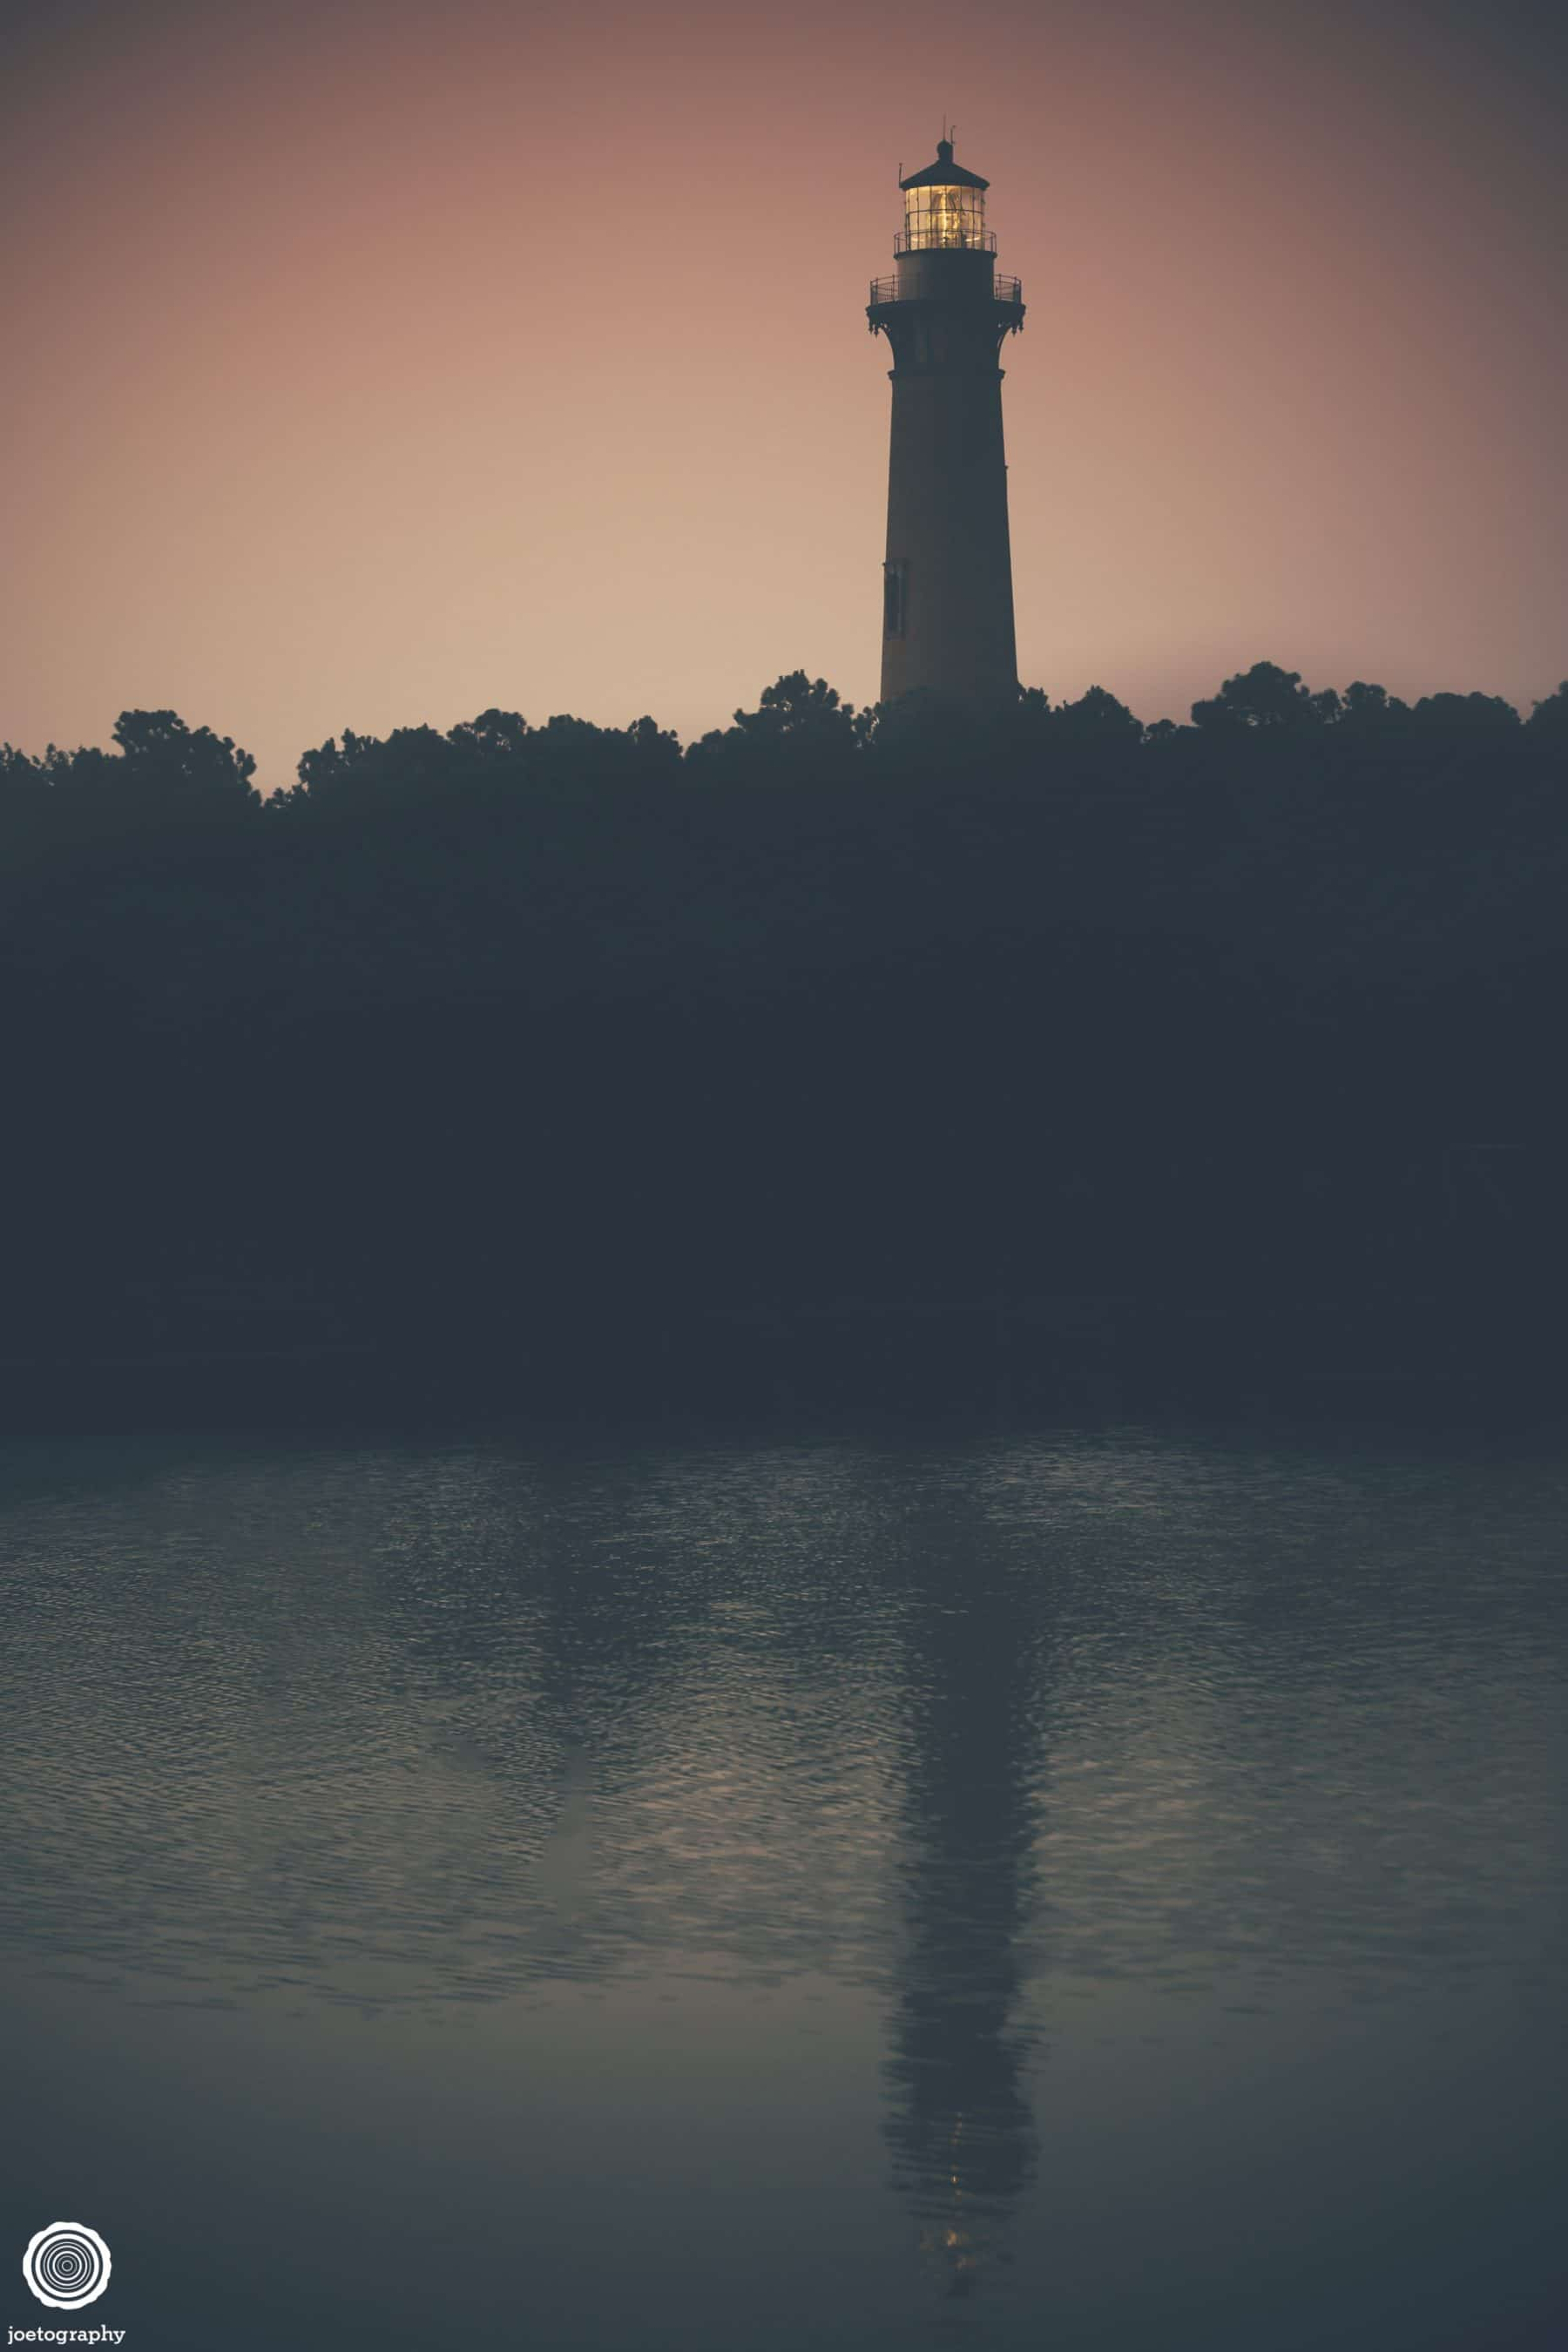 Outer-Banks-North-Carolina-Travel-Photography-5